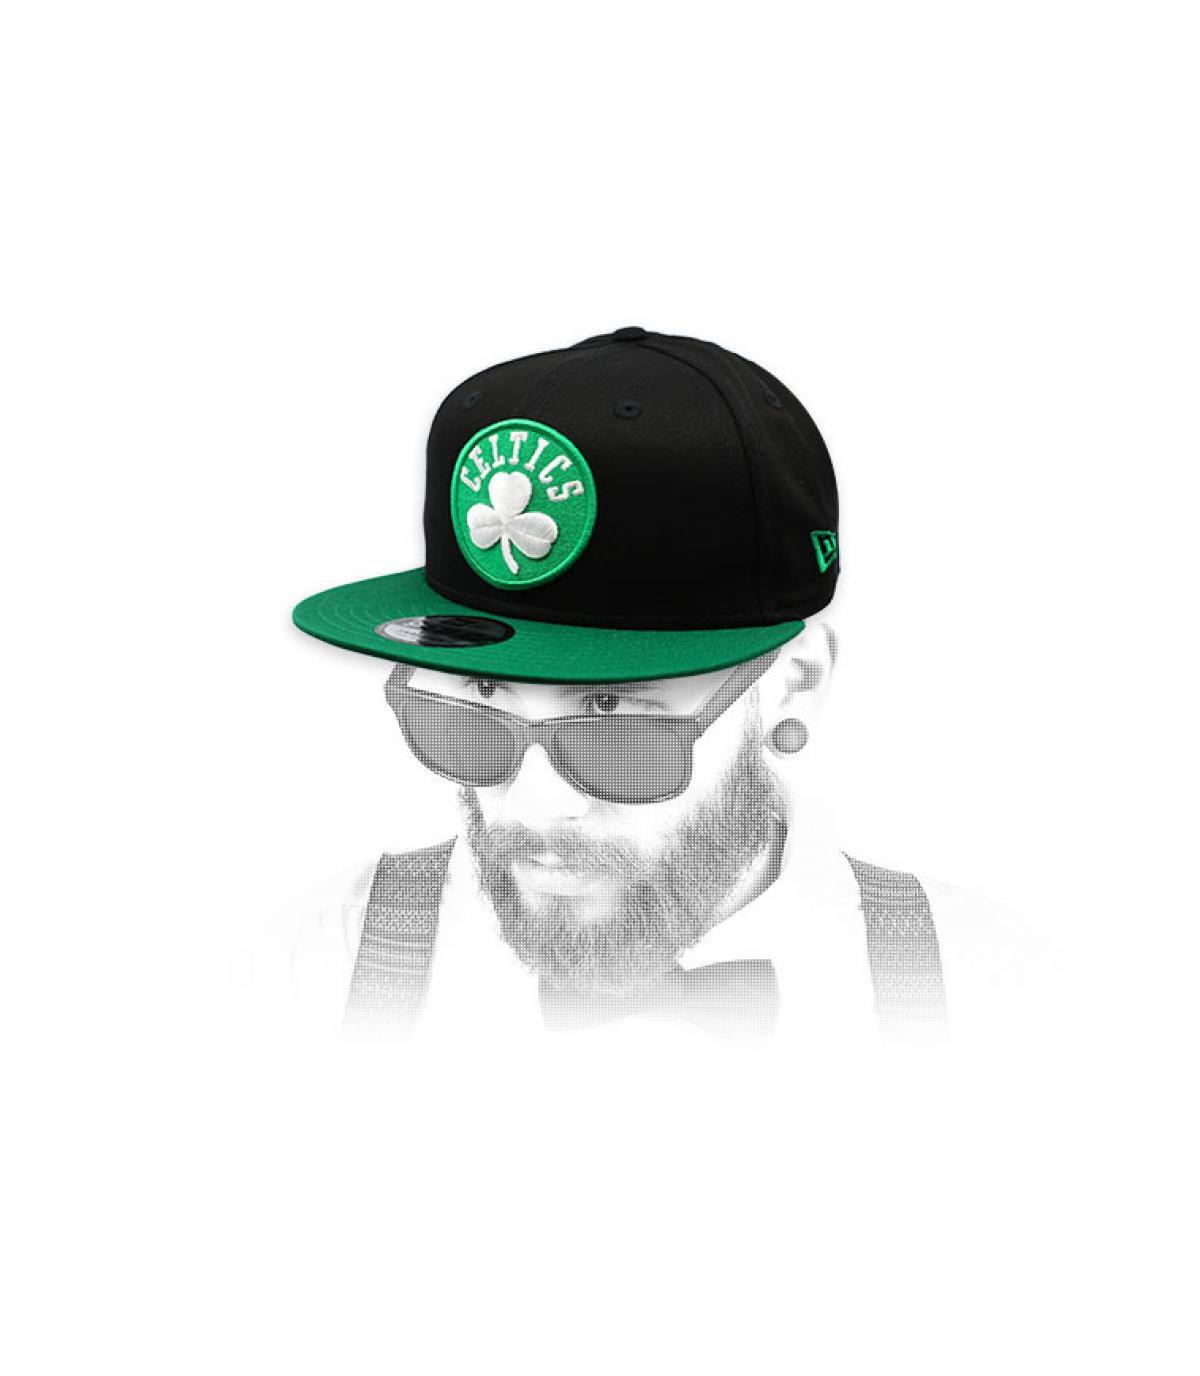 Celtics snapback groen zwart